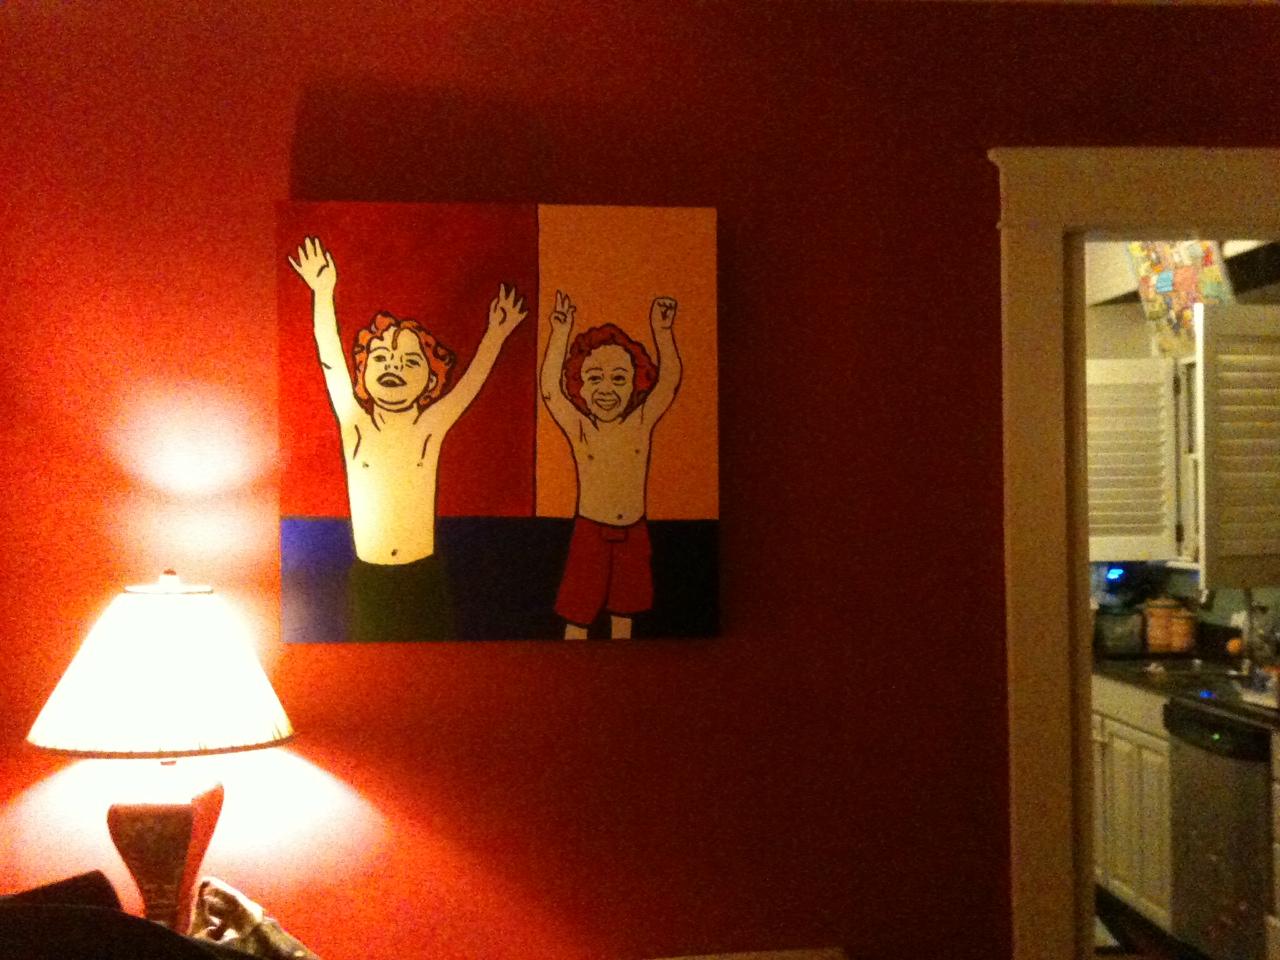 custom-art-commissions-by-greensboro-artist-tracey-marshall-11.jpg